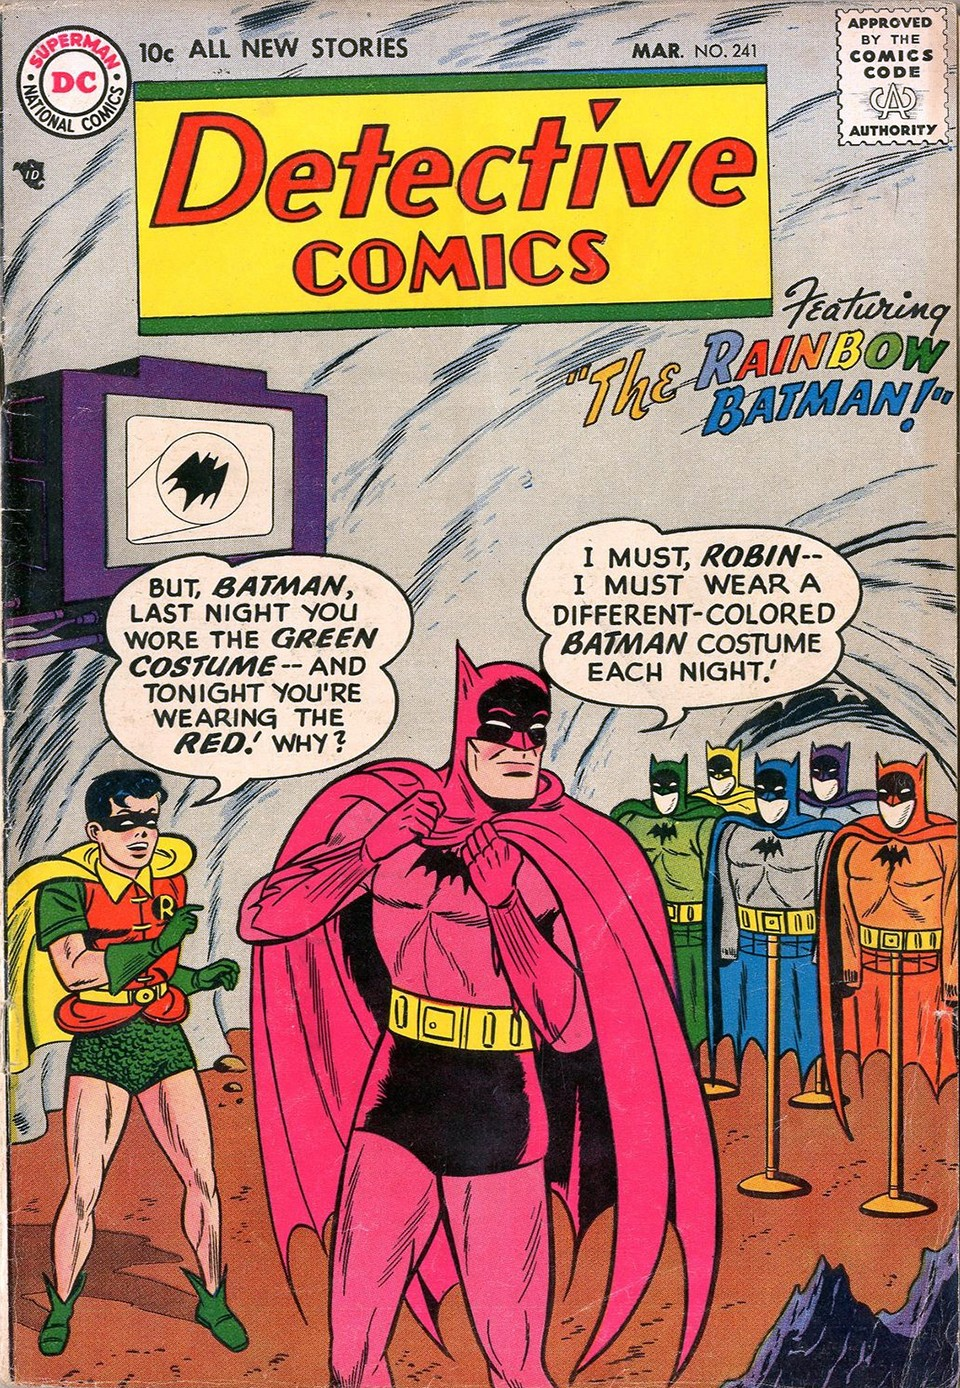 rainbow_batman_detective_comics_1.jpg